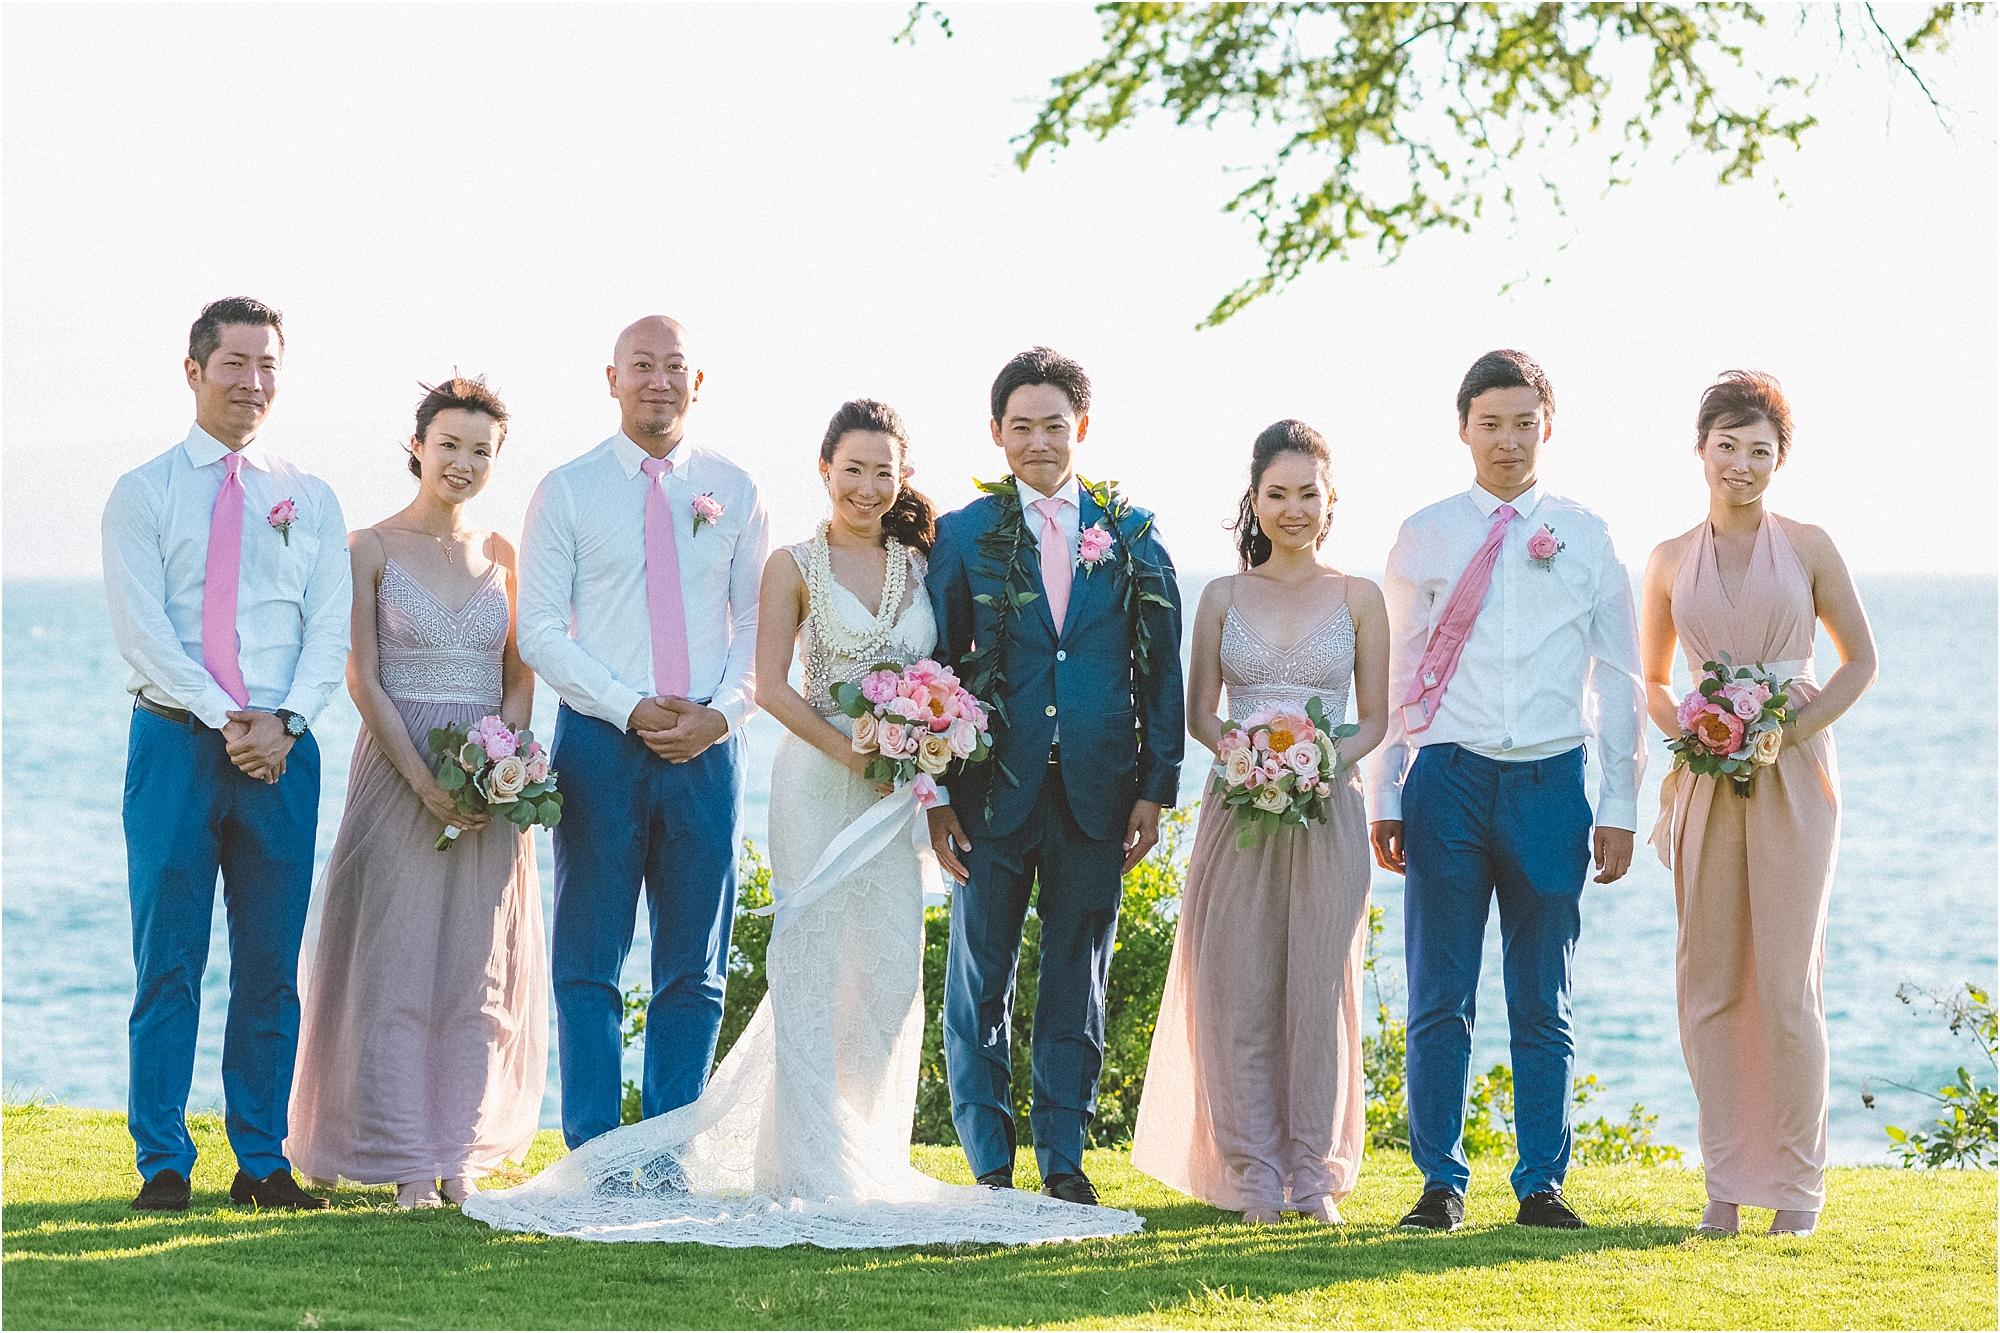 angie-diaz-photography-maui-hawaii-destination-wedding-makena-golf-beach-club_0047.jpg